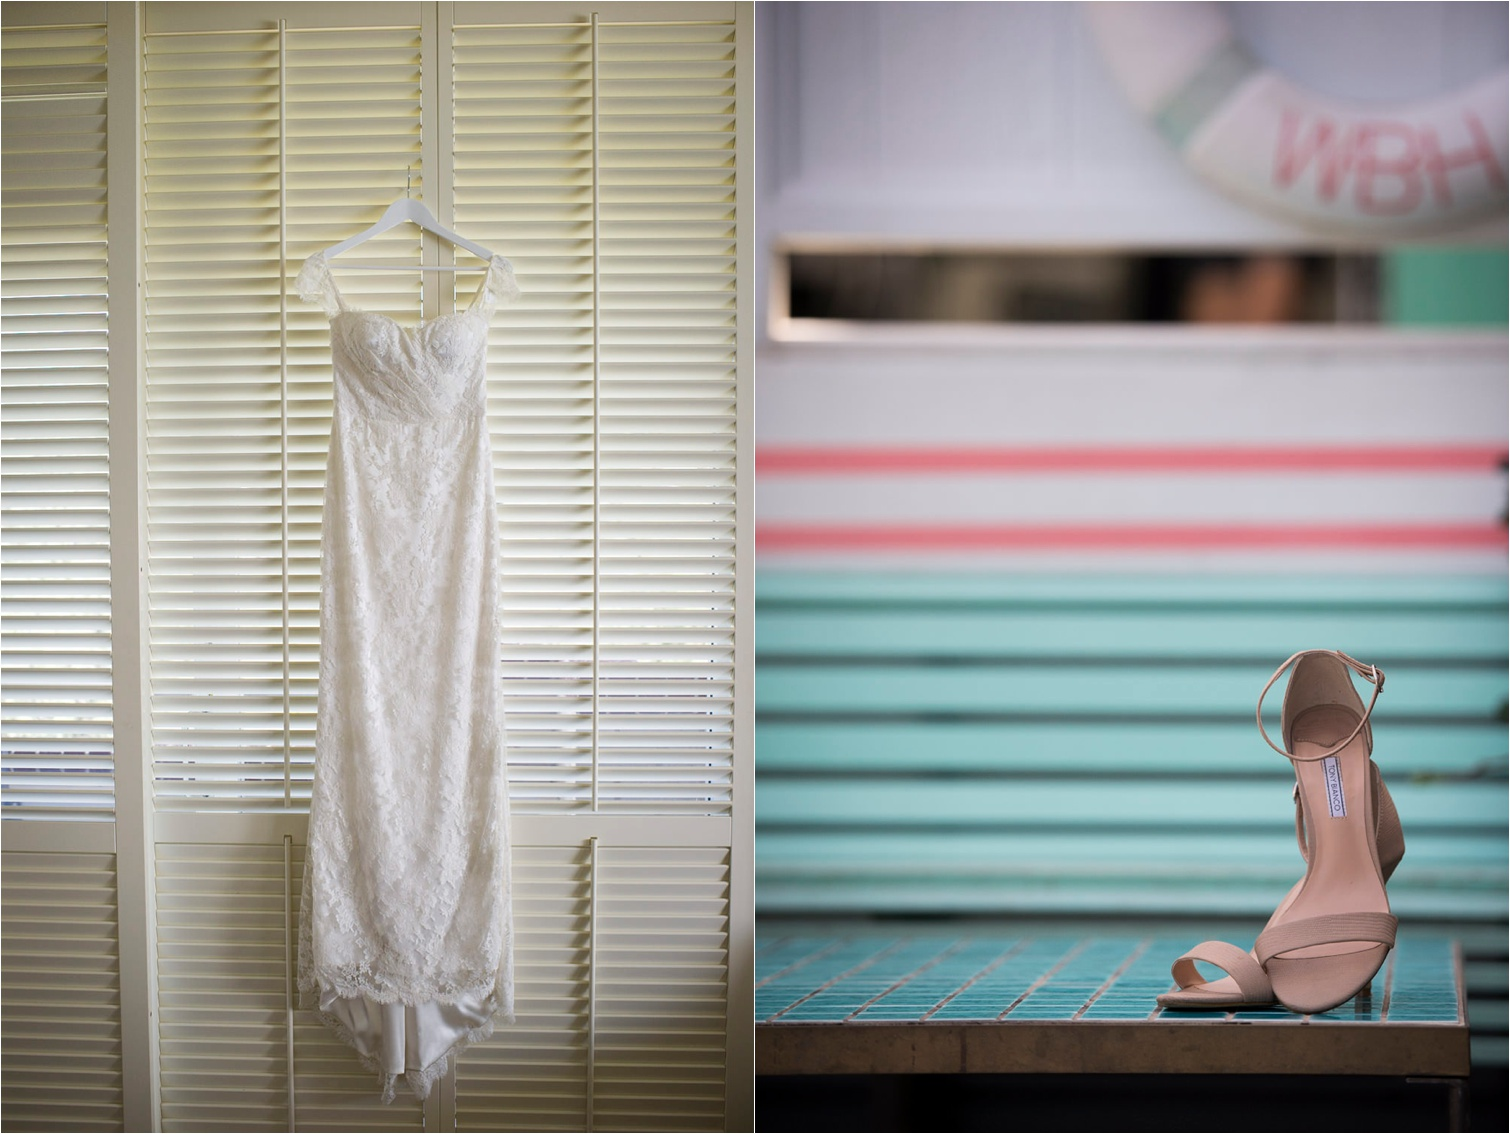 Nicole&Carlie_Watsons_Bay_Hotel_Wedding_by_Gold_Coast_Photographers-The_Follans1.jpg